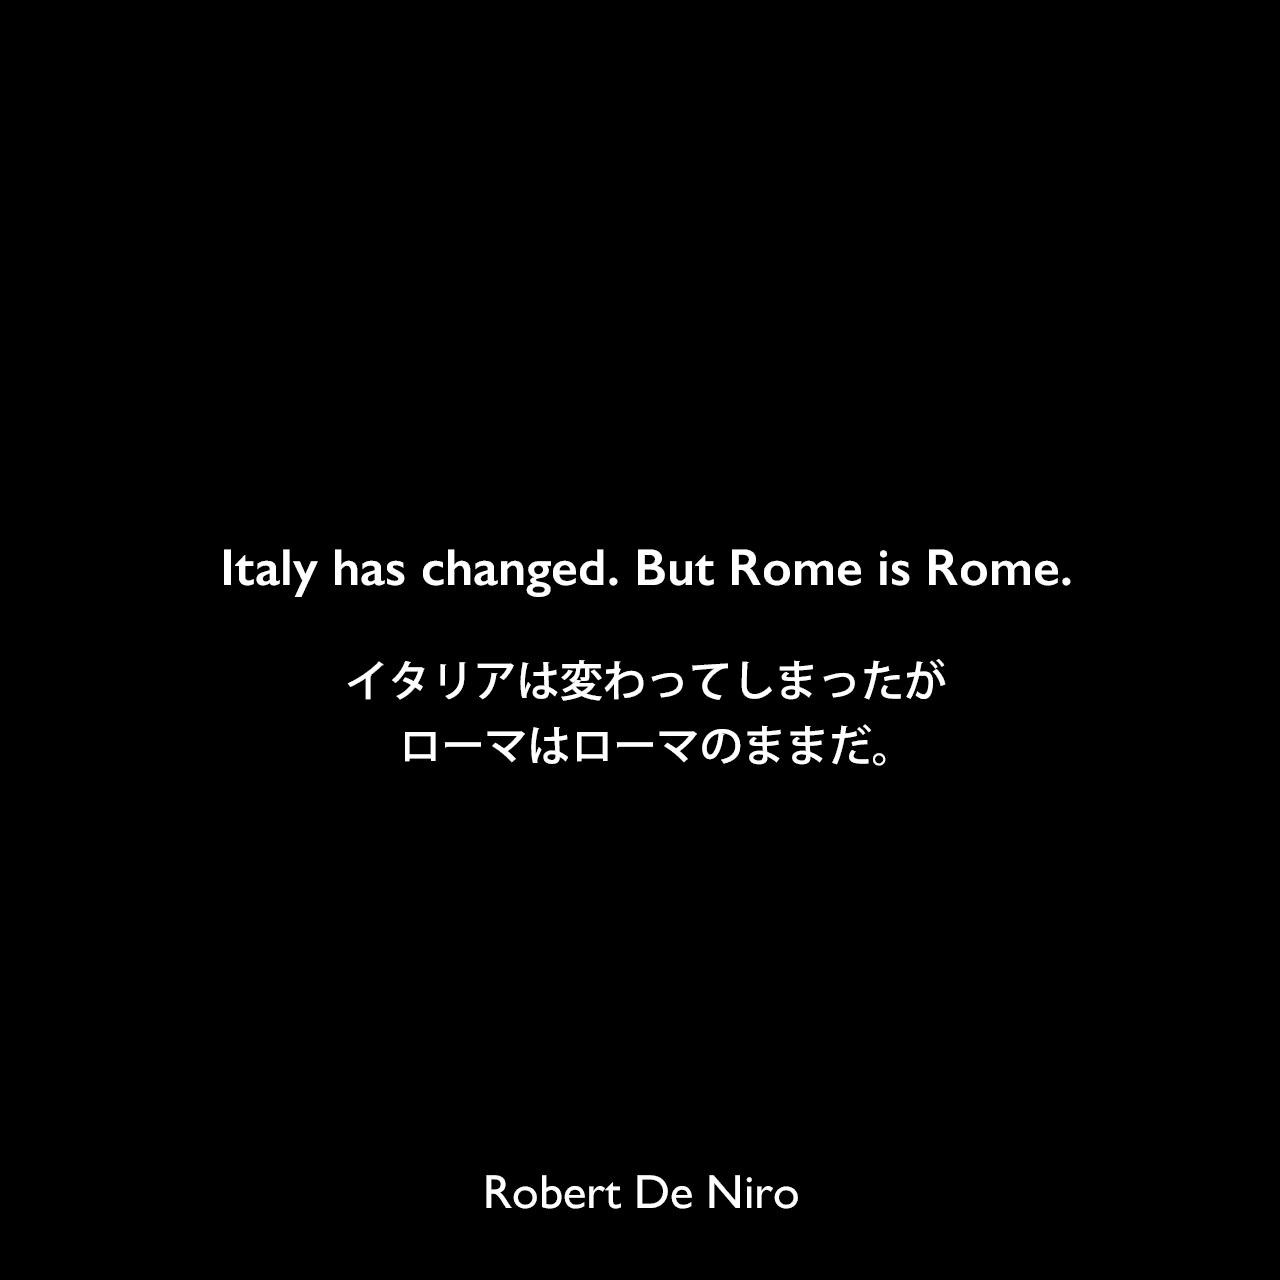 Italy has changed. But Rome is Rome.イタリアは変わってしまったが、ローマはローマのままだ。Robert De Niro